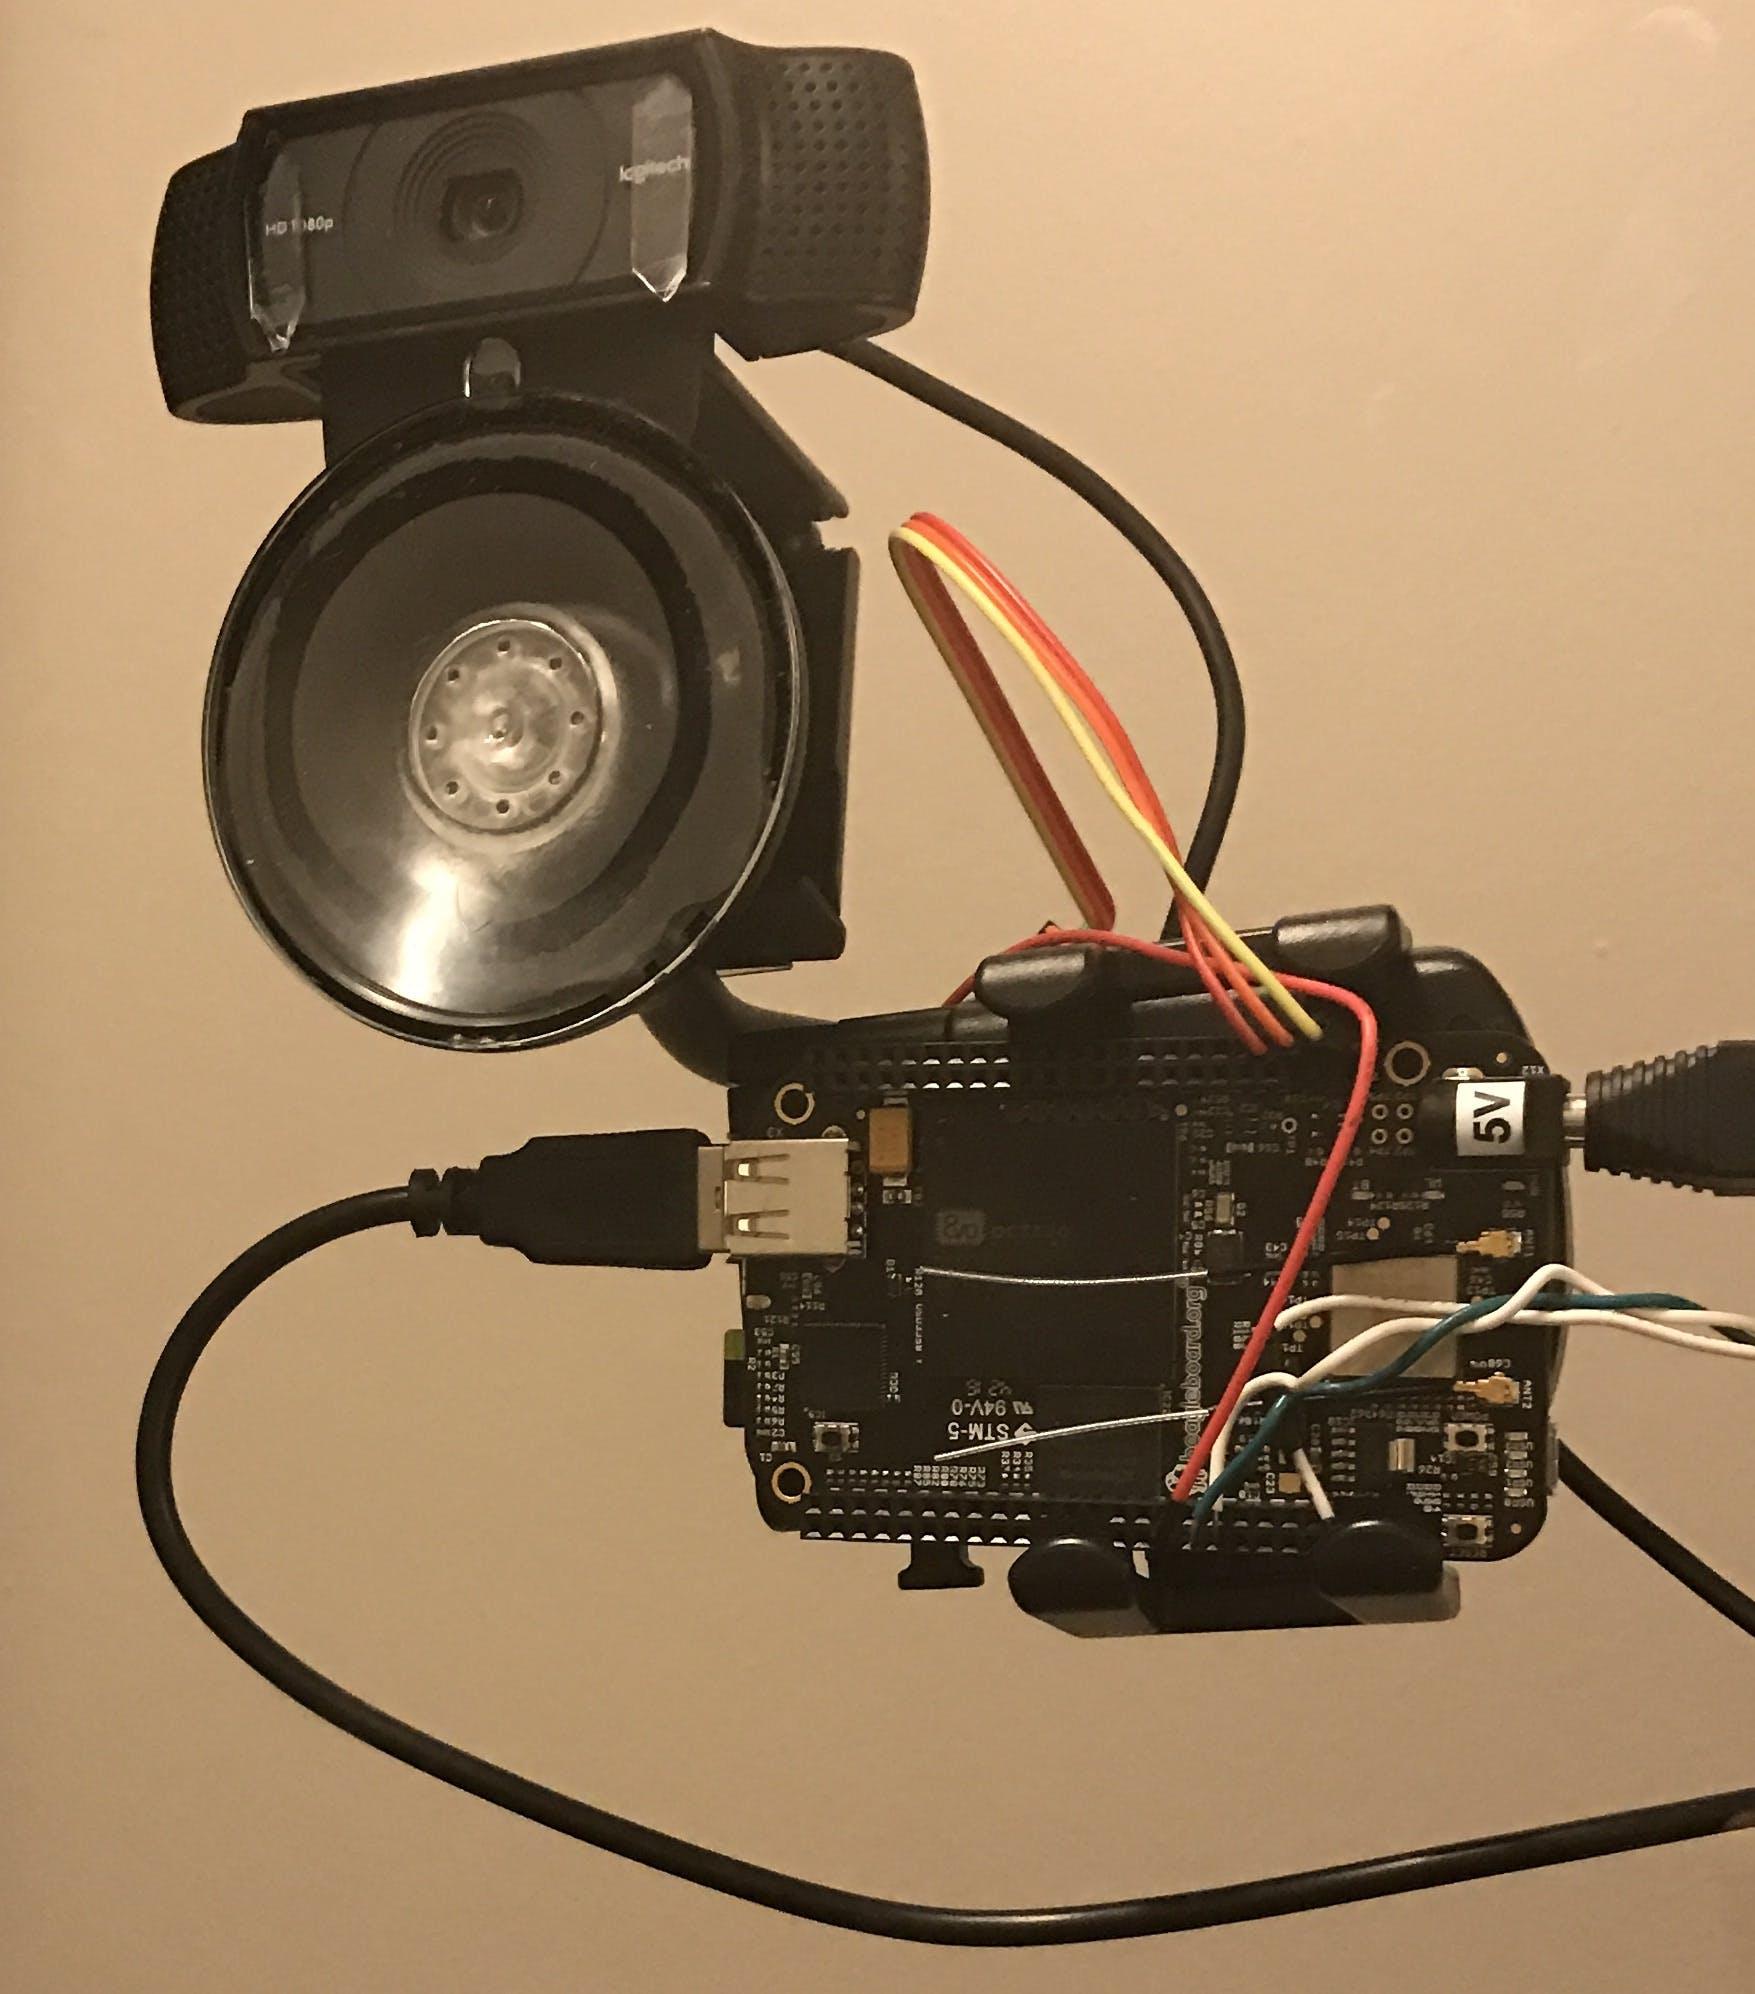 Logitech HD camera + BeagleBone Black Wireless